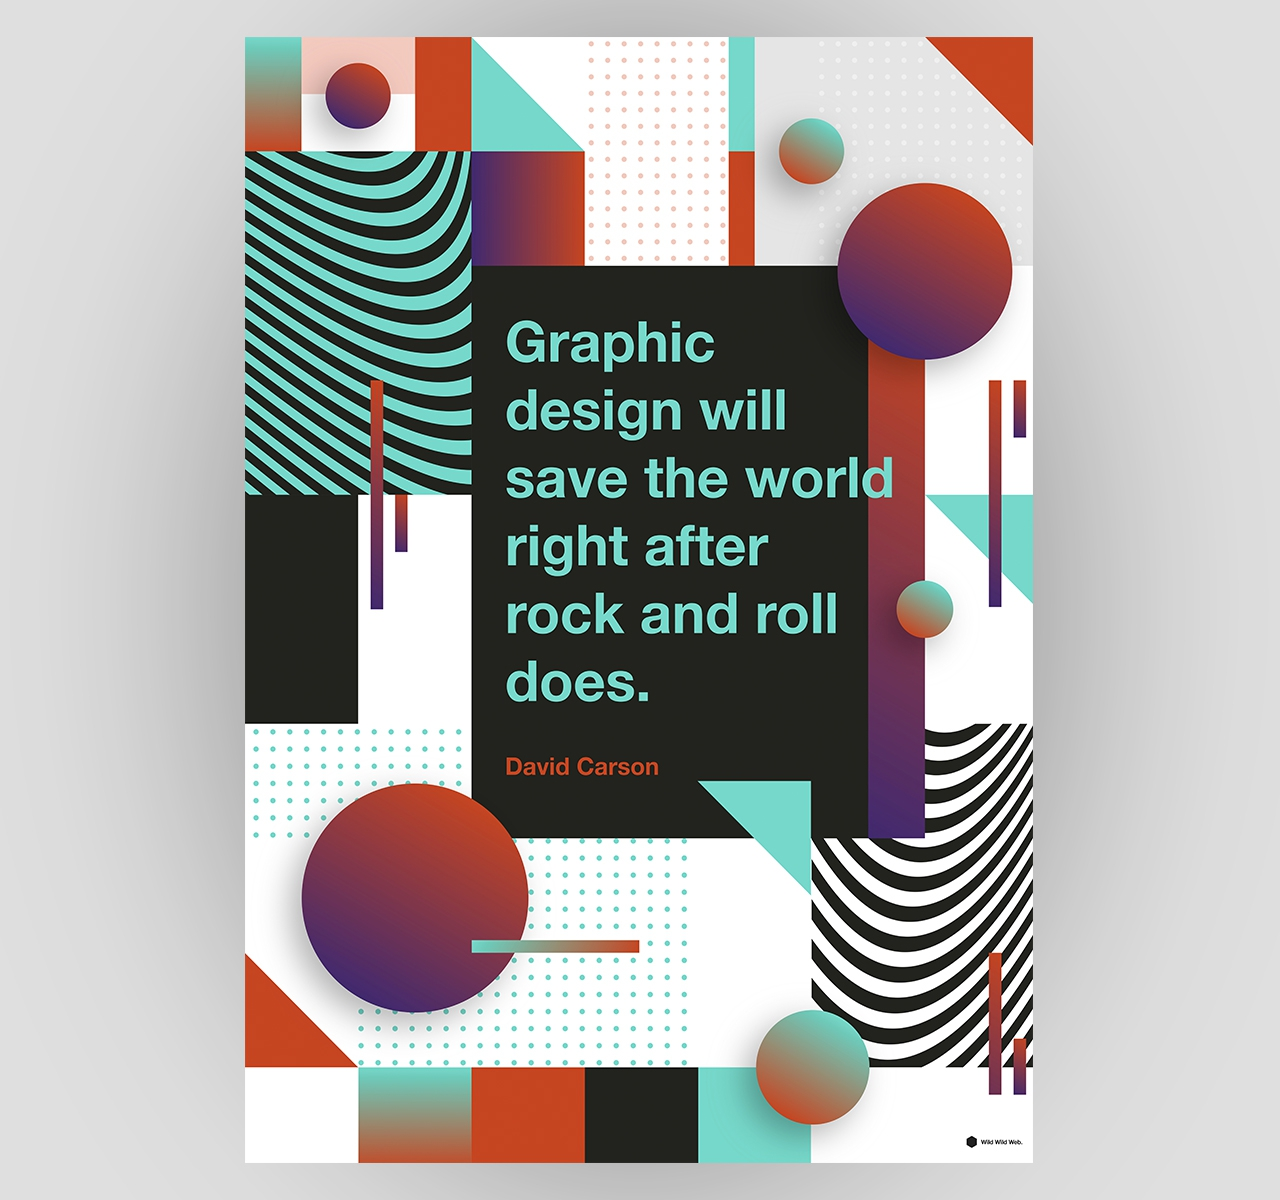 7 pósteres para os amantes do design gráfico